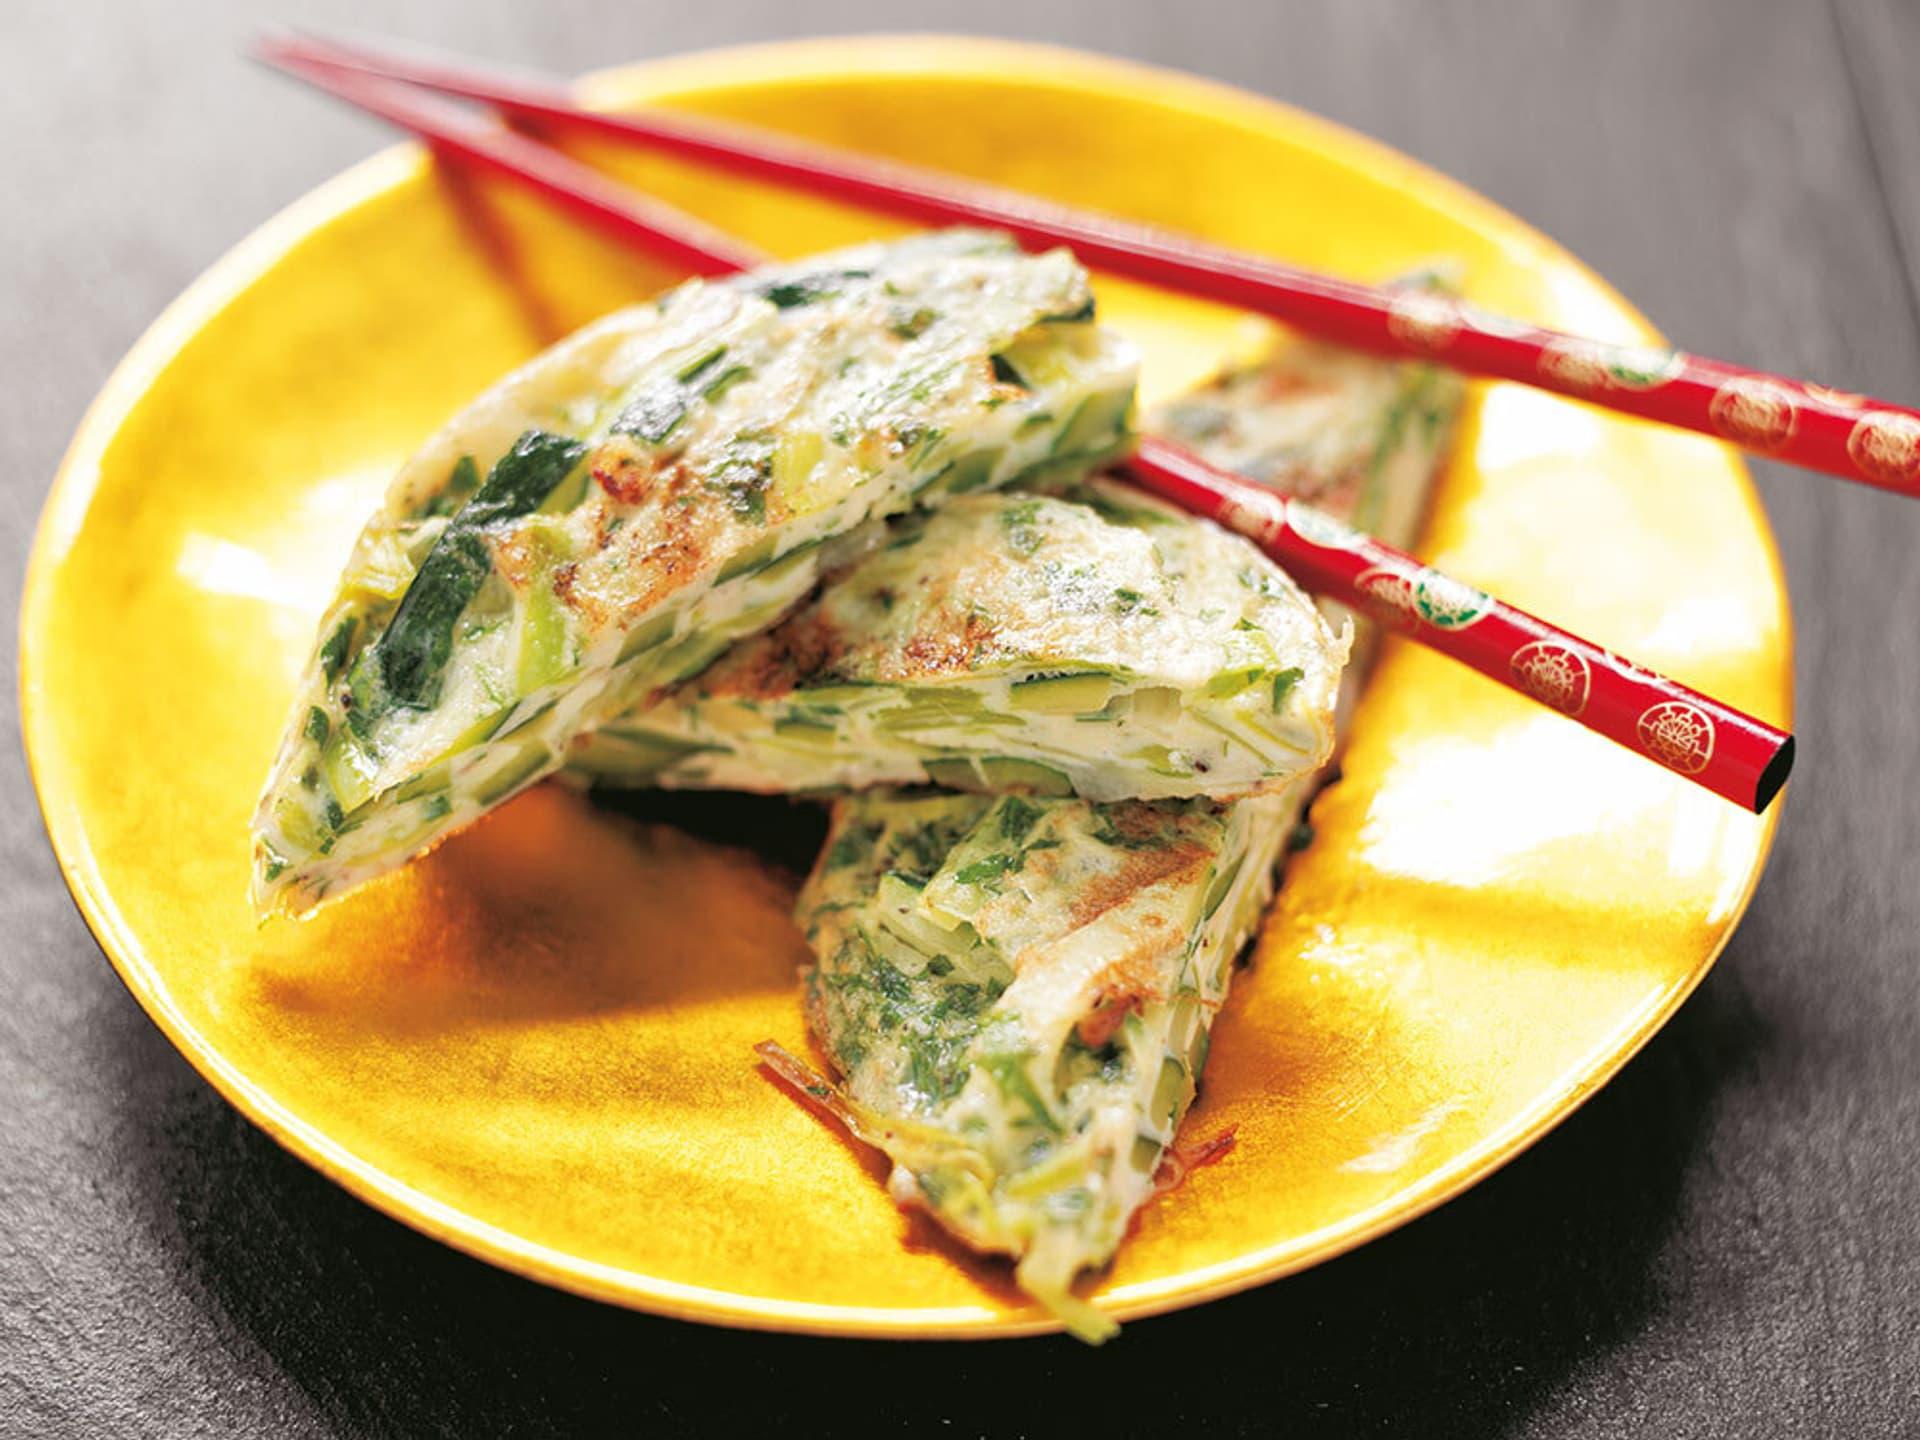 Lauch-Zucchini-Frittata